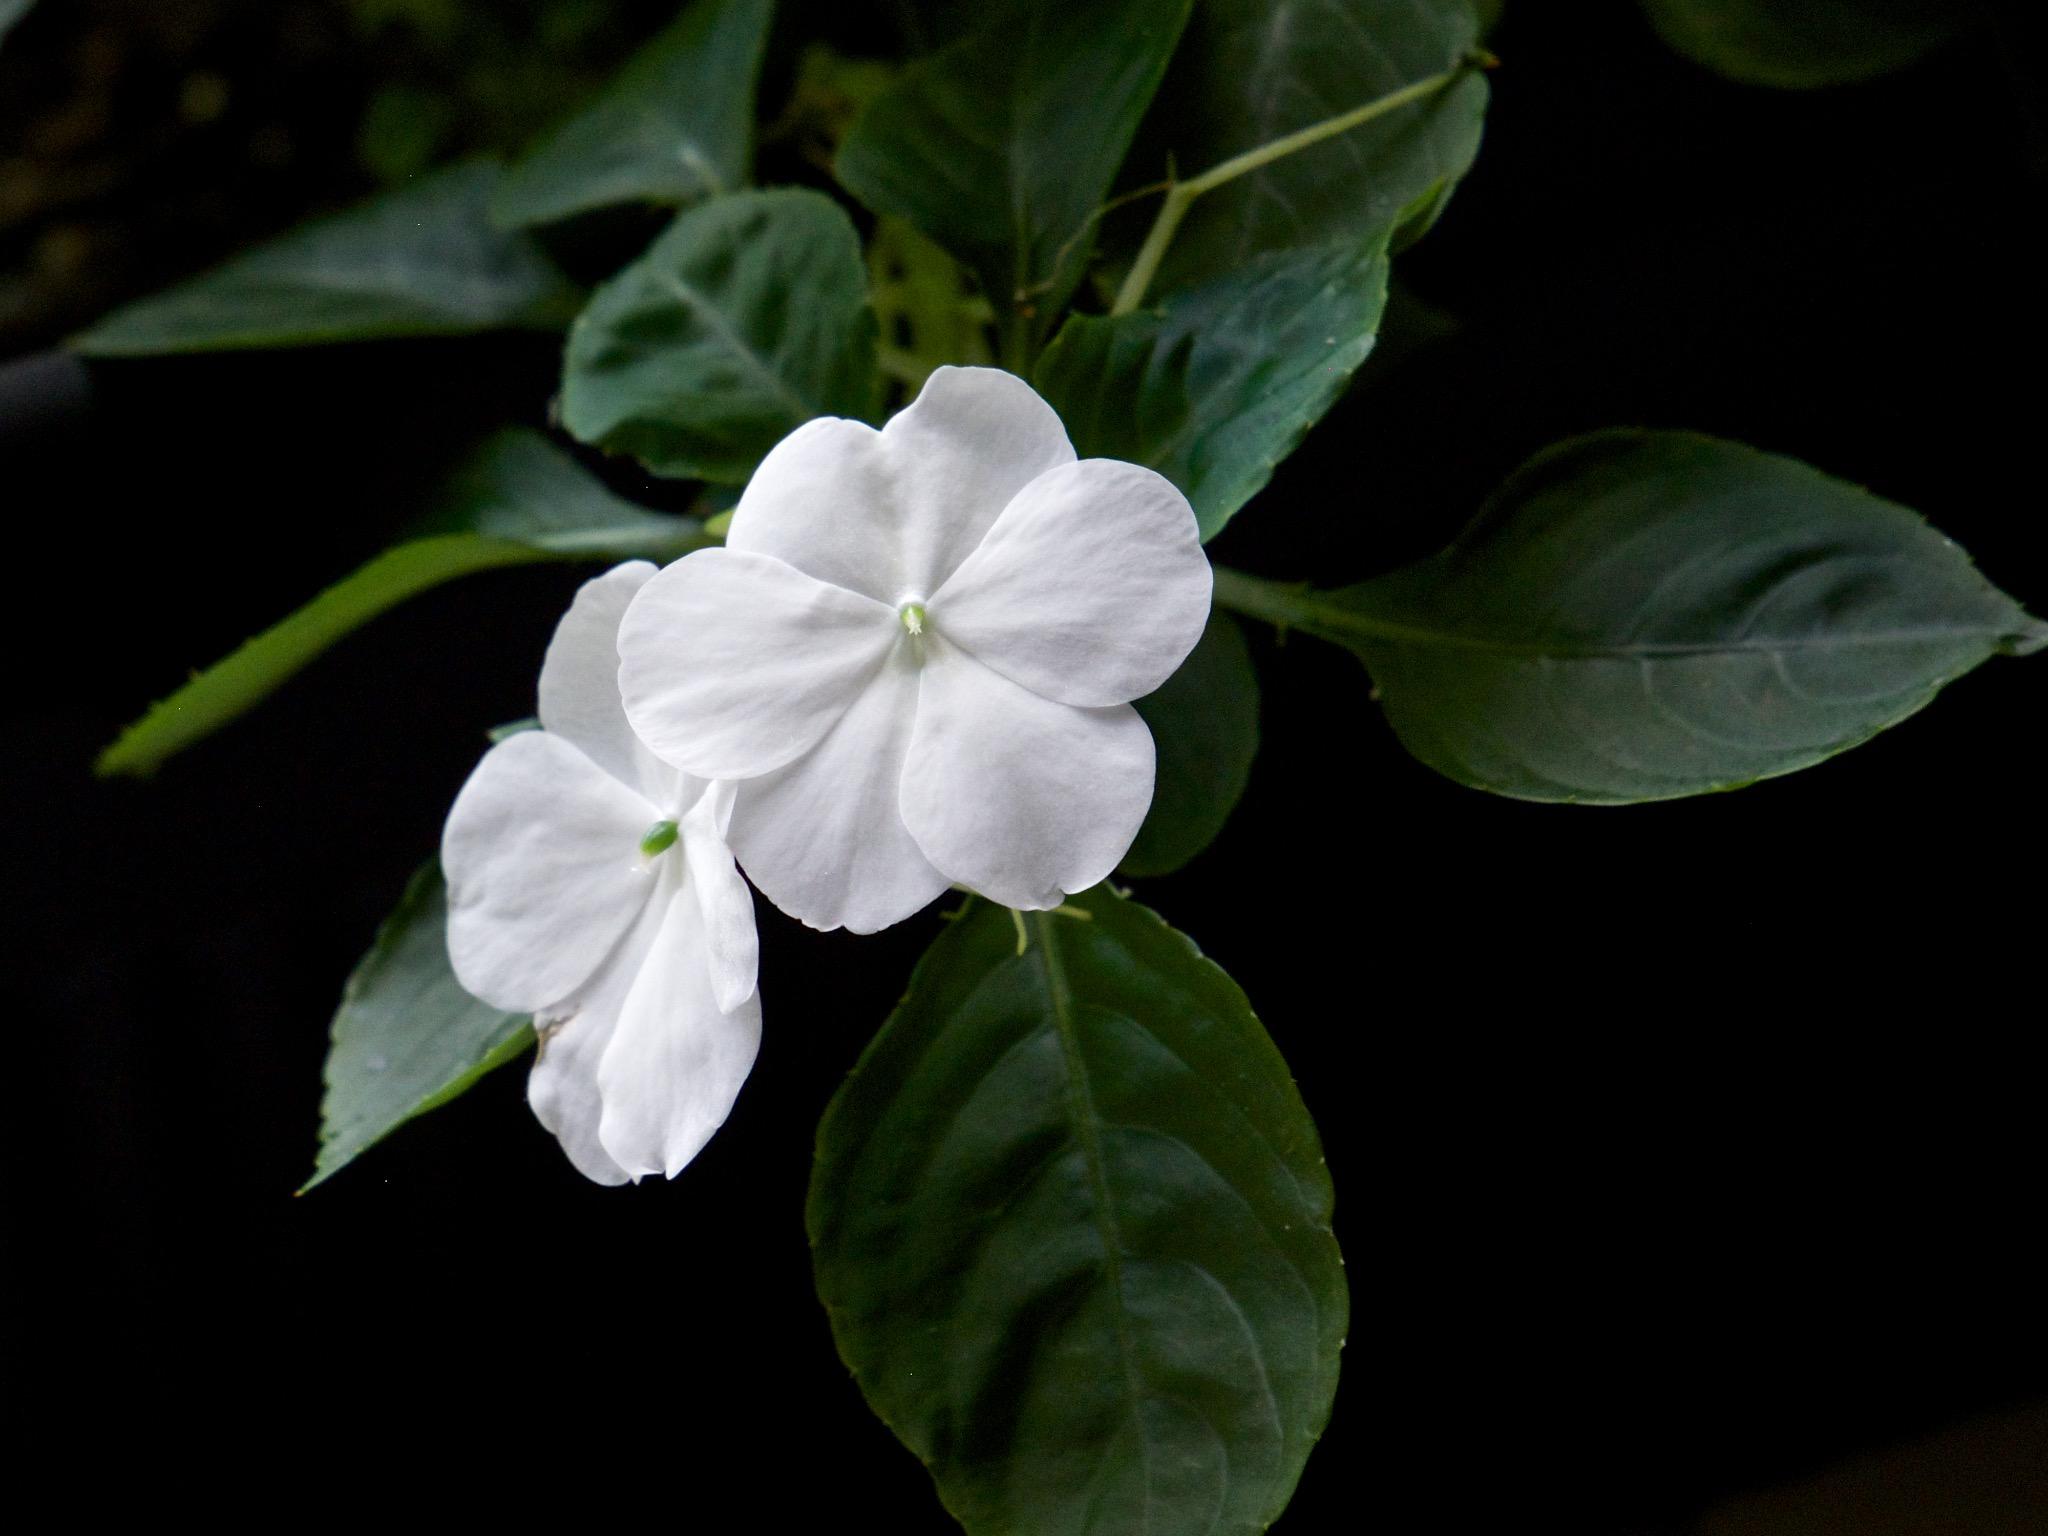 http://thedigitalstory.com/2014/12/05/panasonic-35-100mm-flower.jpg